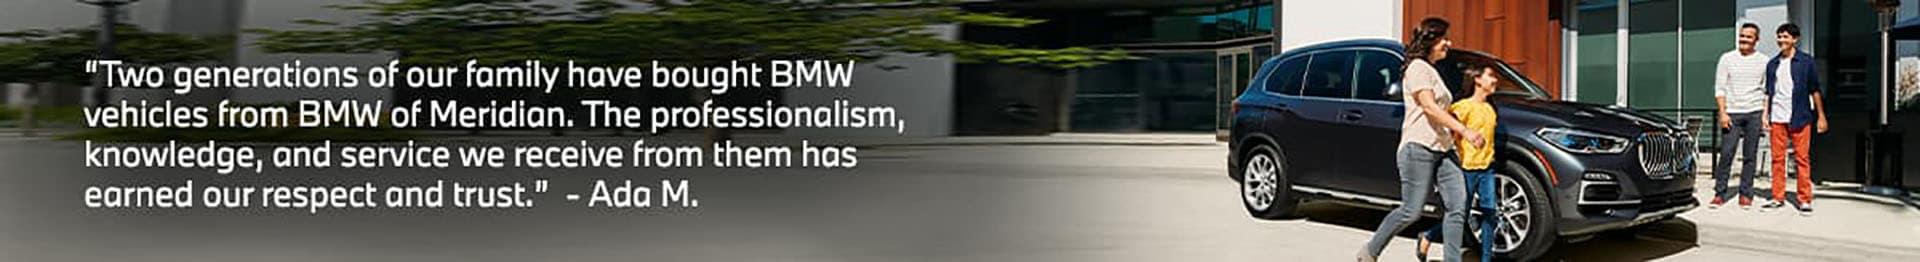 BMWMeridian_Testimonial_SRPbanner